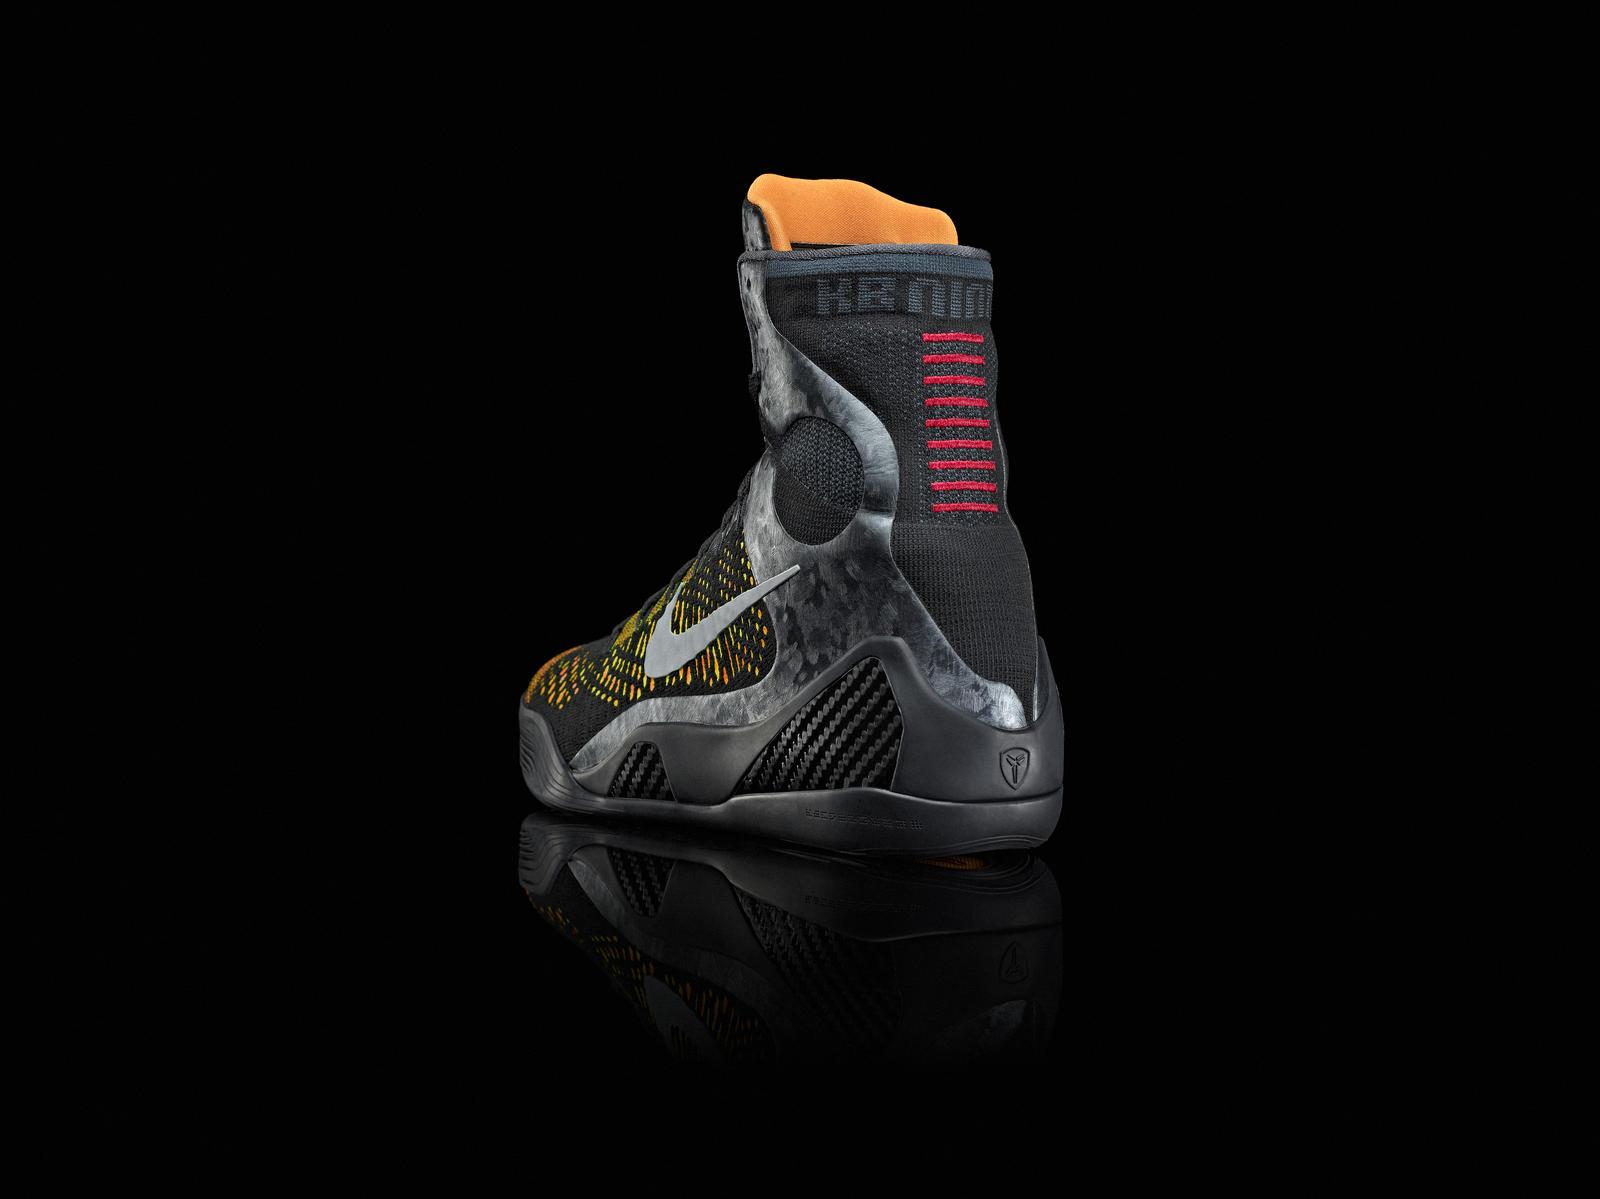 Cheap New Nike Kobe 9 Elite Cheap sale Limited Edition White Fly